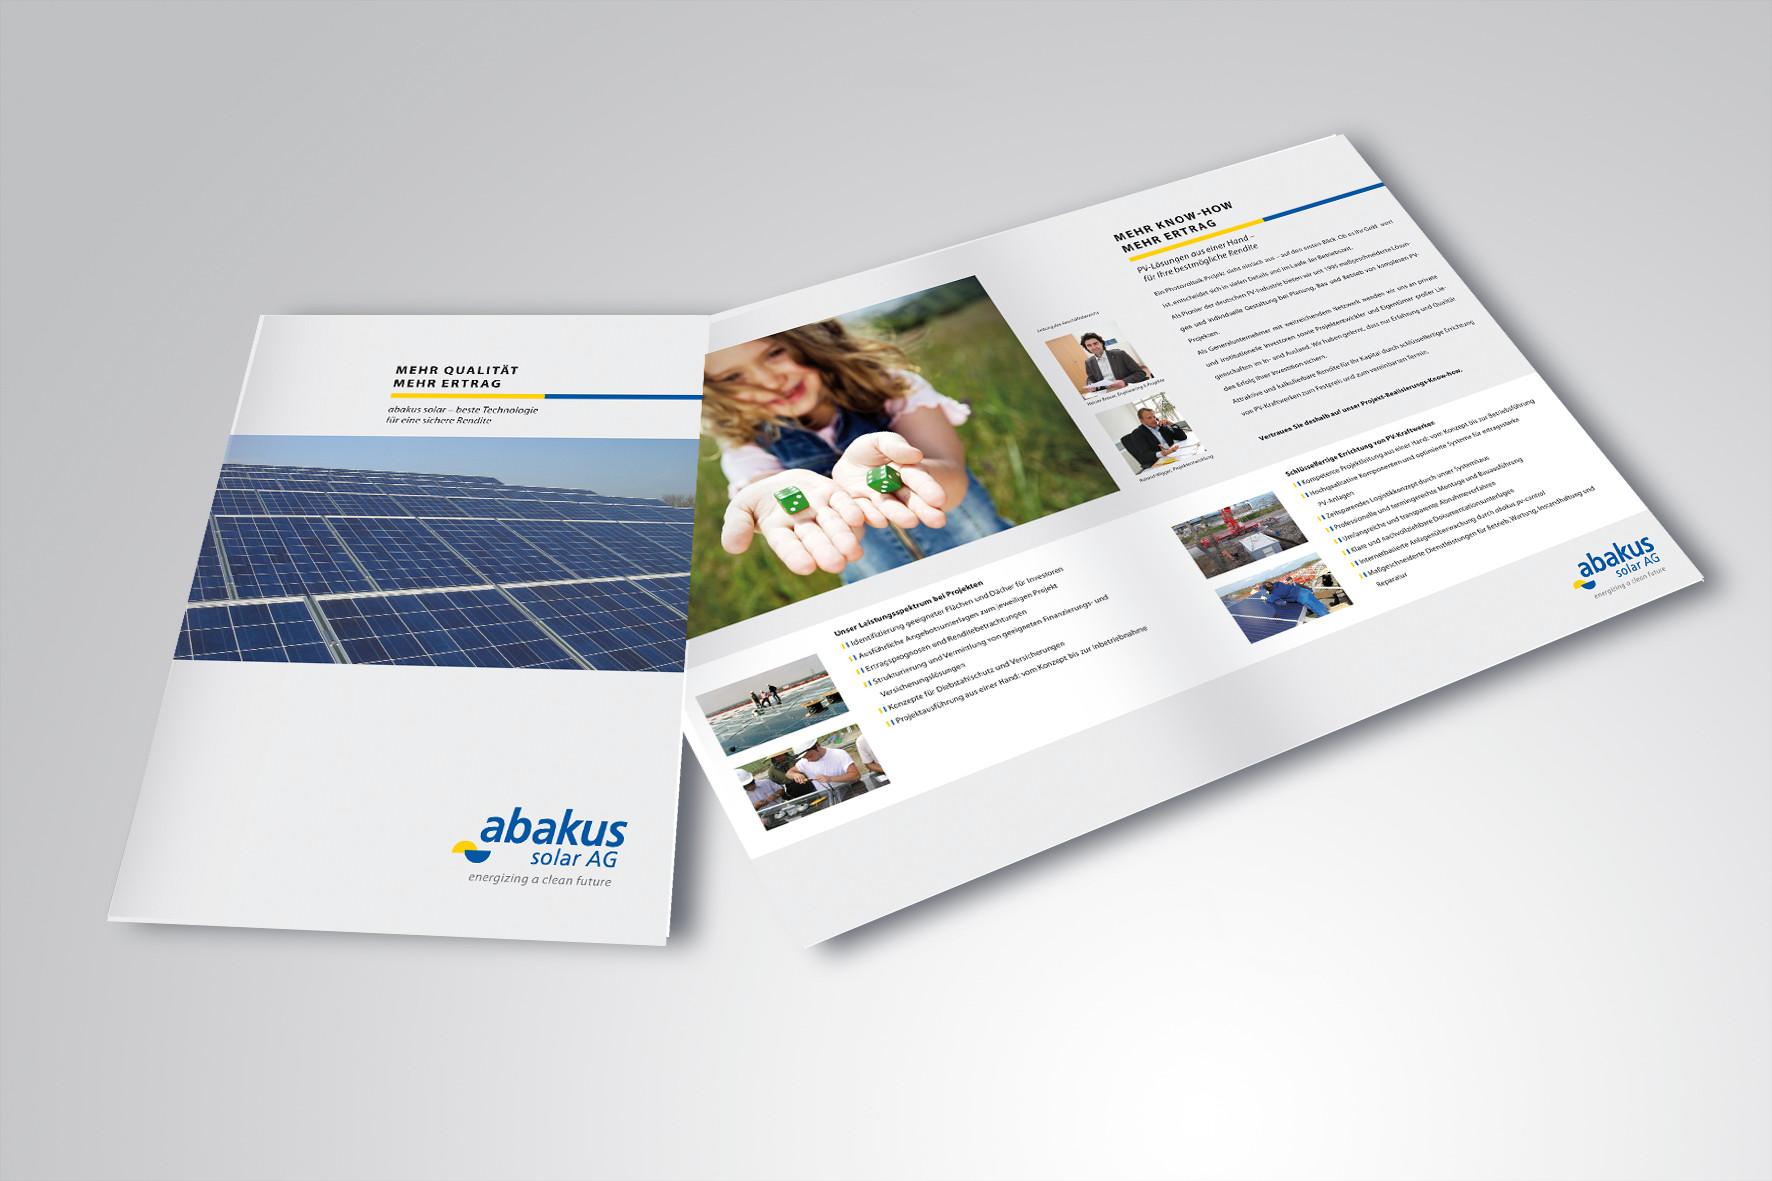 Kunde: abakus solar AG · Produkt: Engineering Broschüre